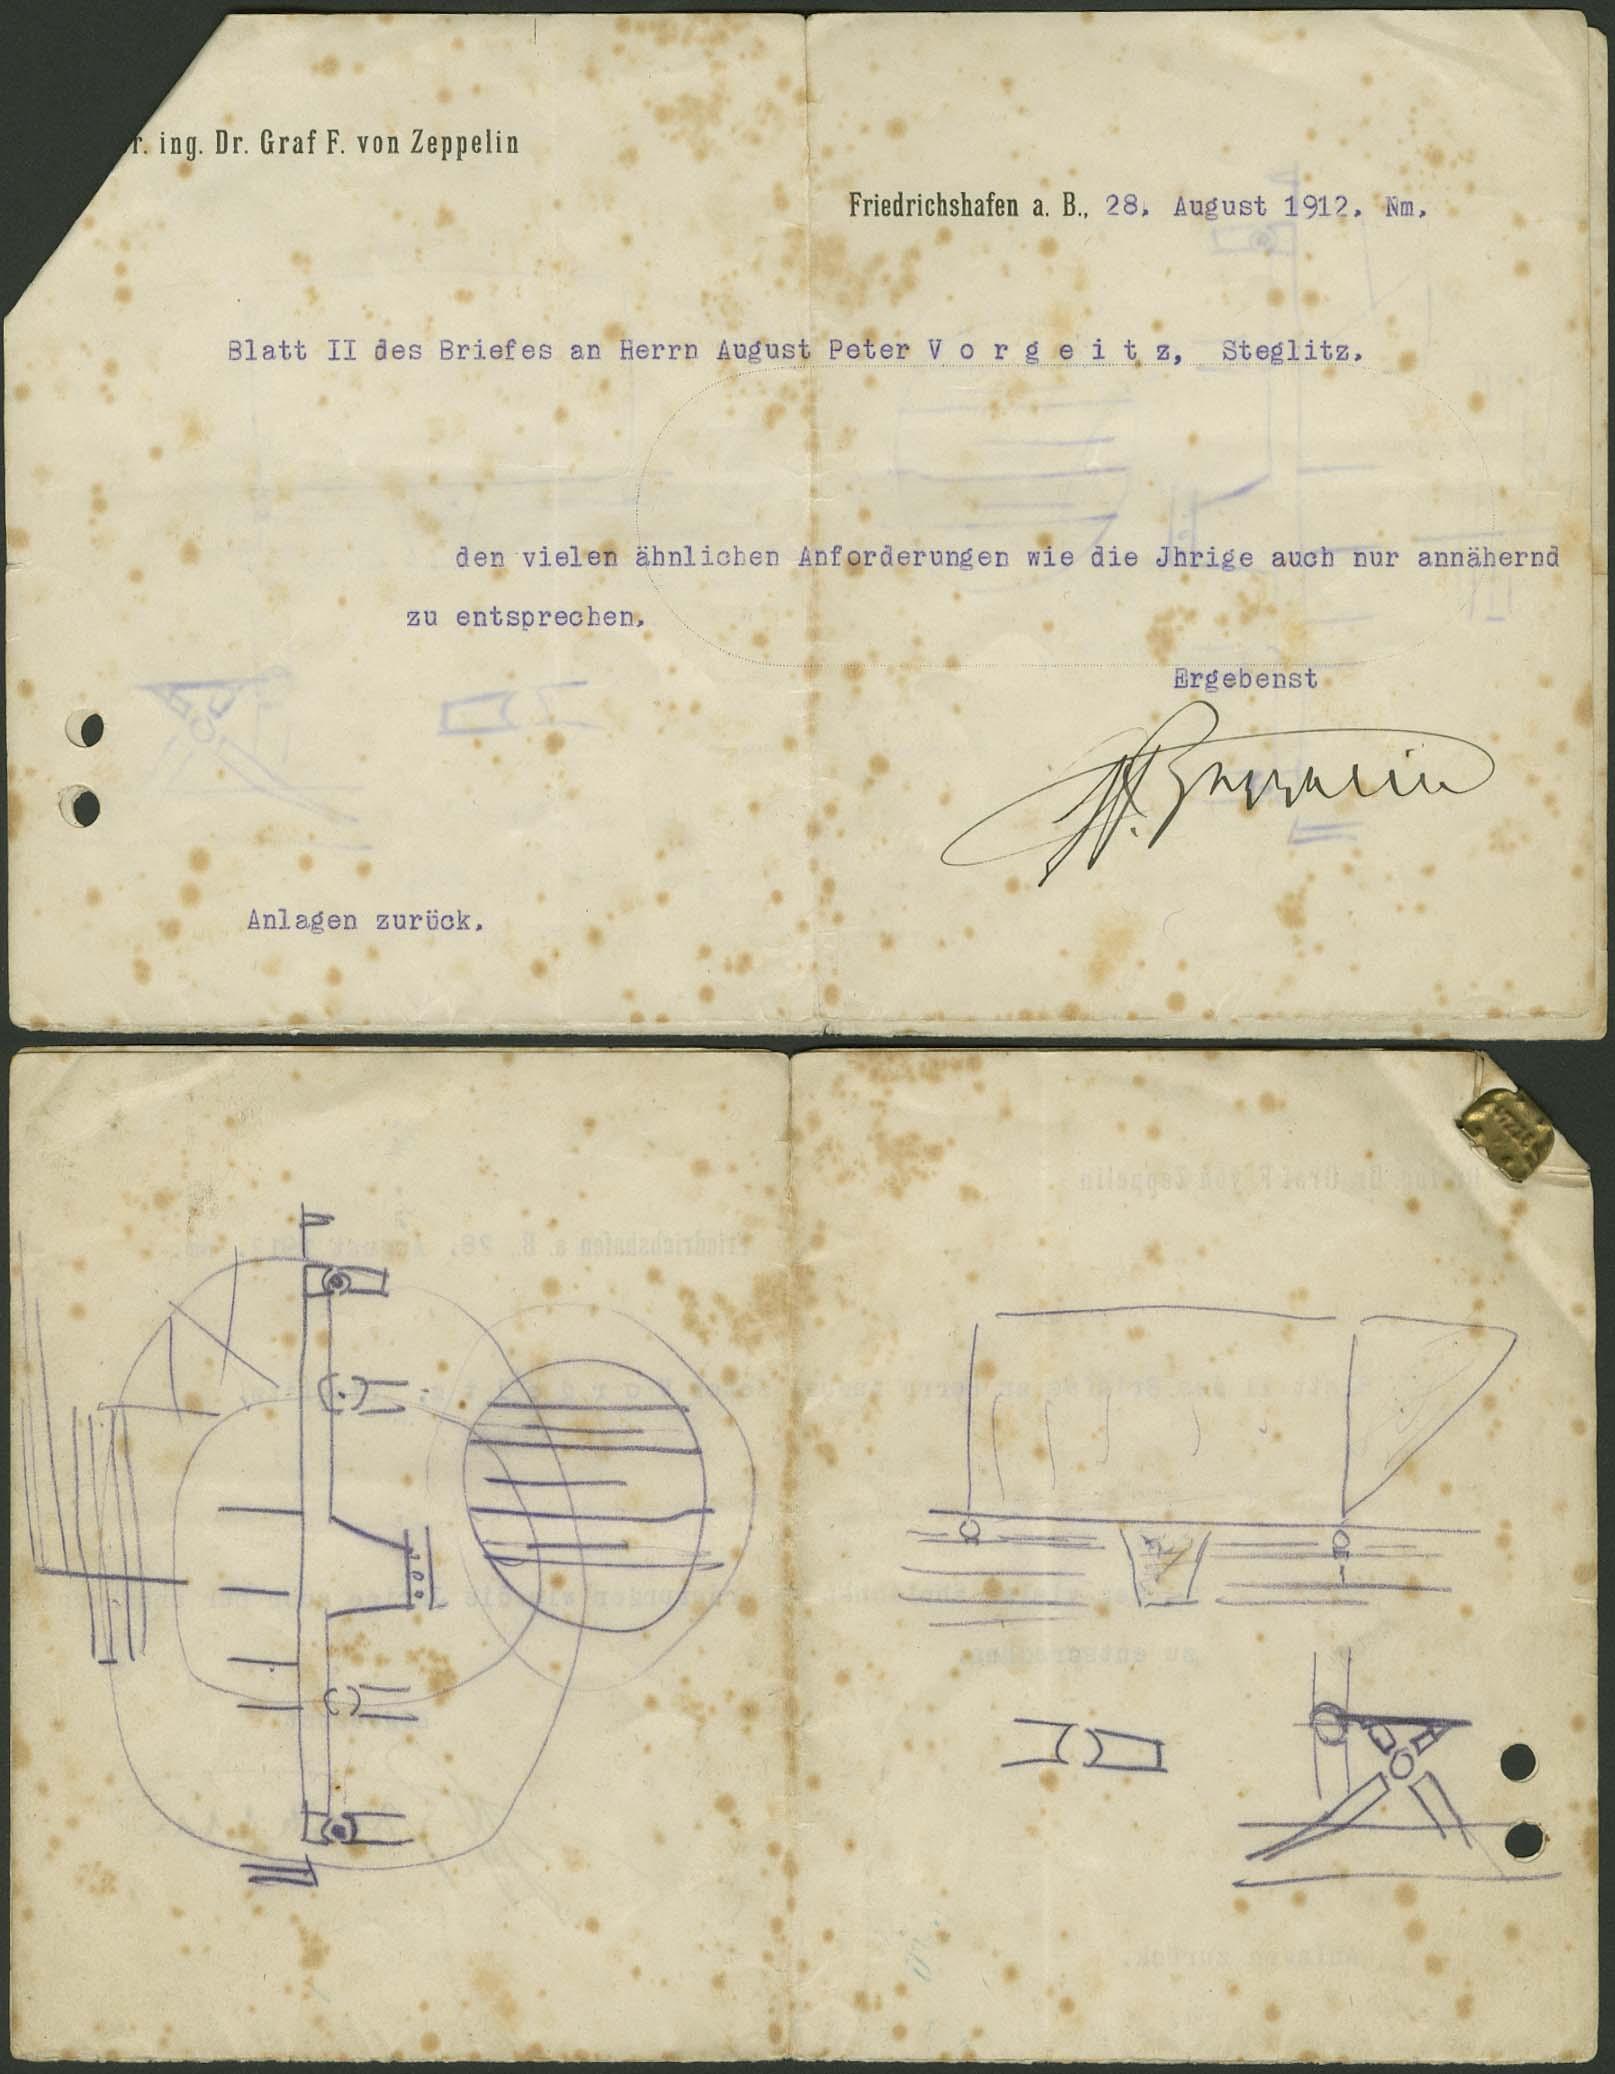 Lot 4118 - Zeppelin-Memorabilien Memorabilien -  Auktionshaus Ulrich Felzmann GmbH & Co. KG